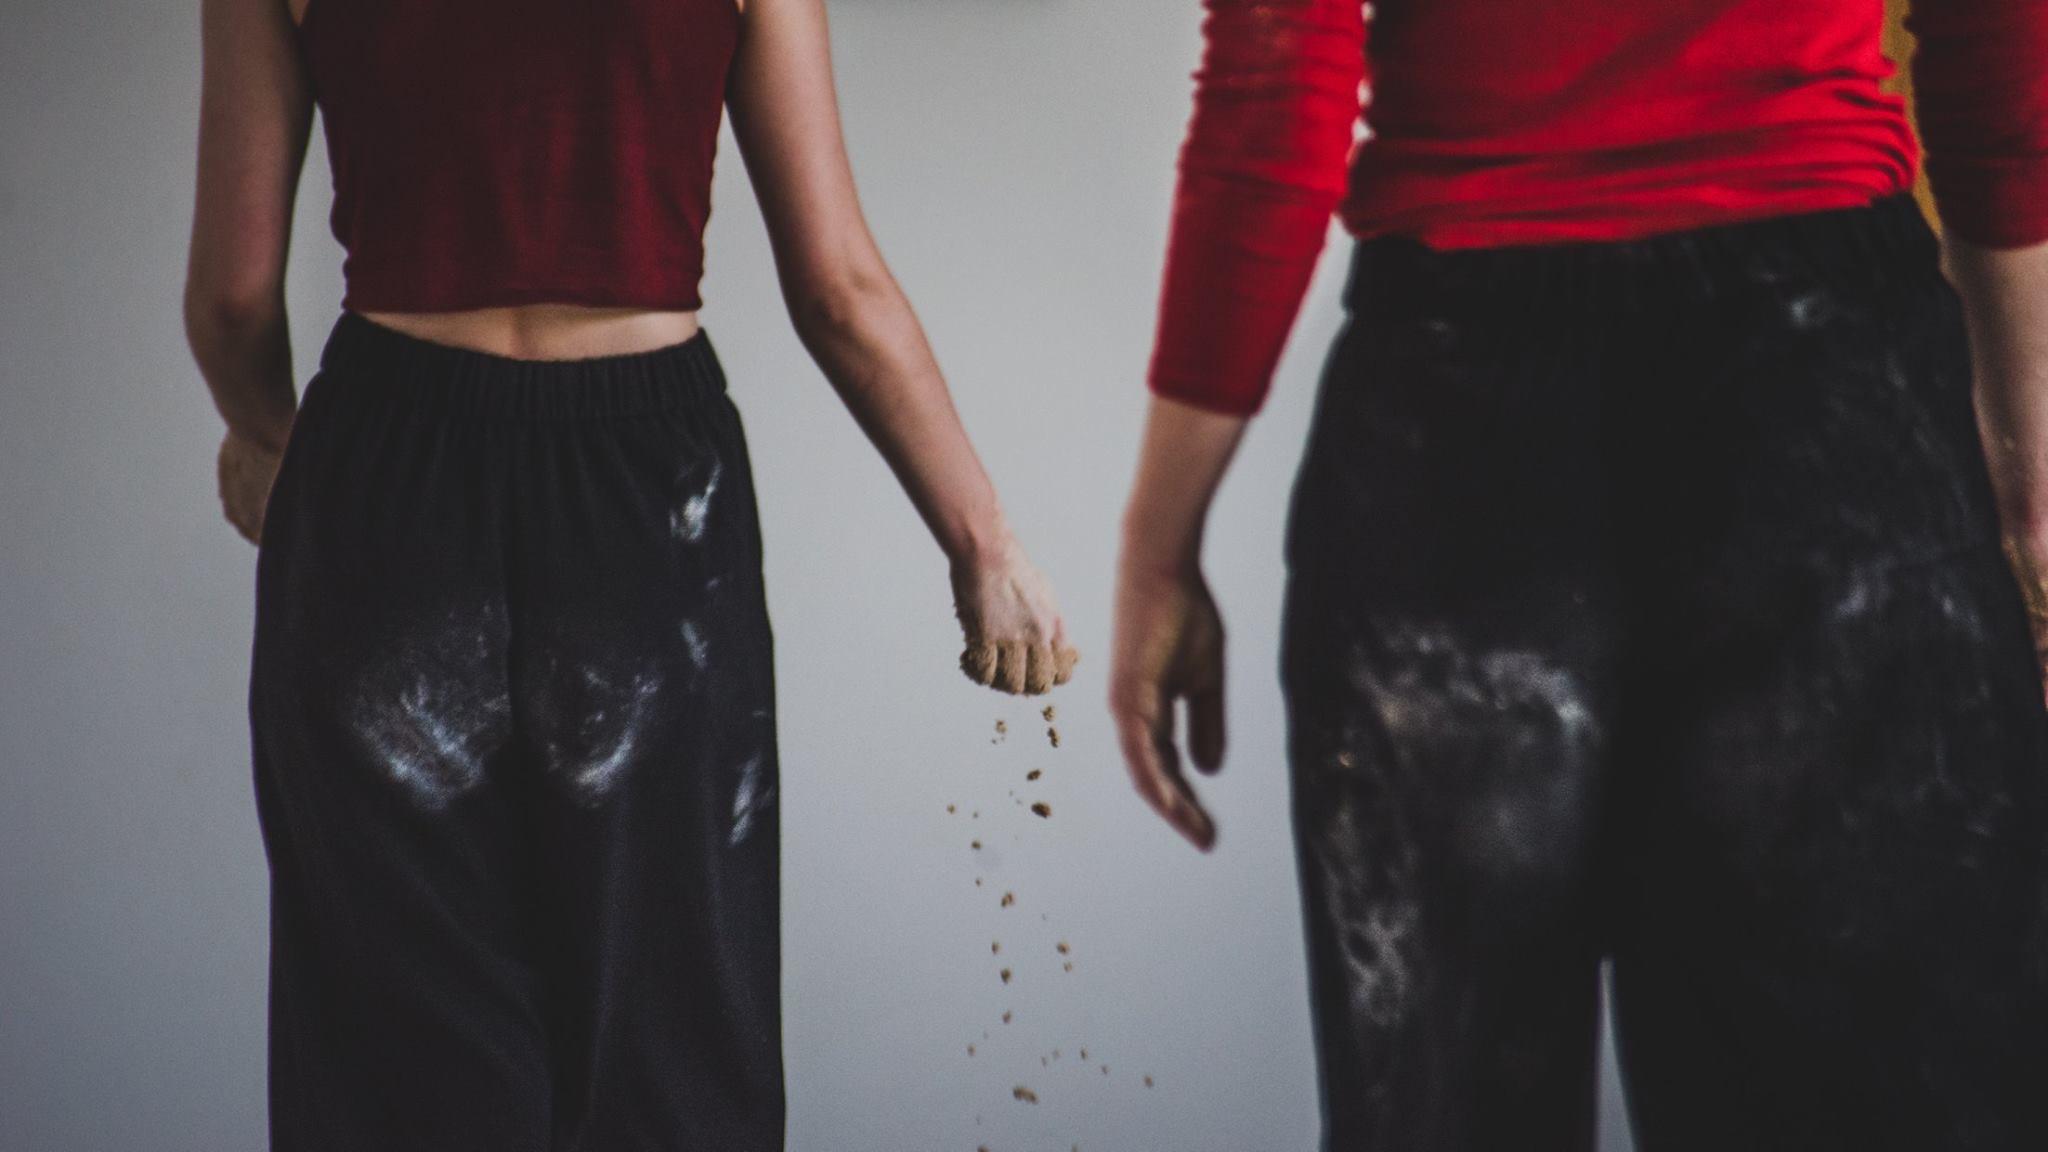 ArtSur, photography by Ana Agraz